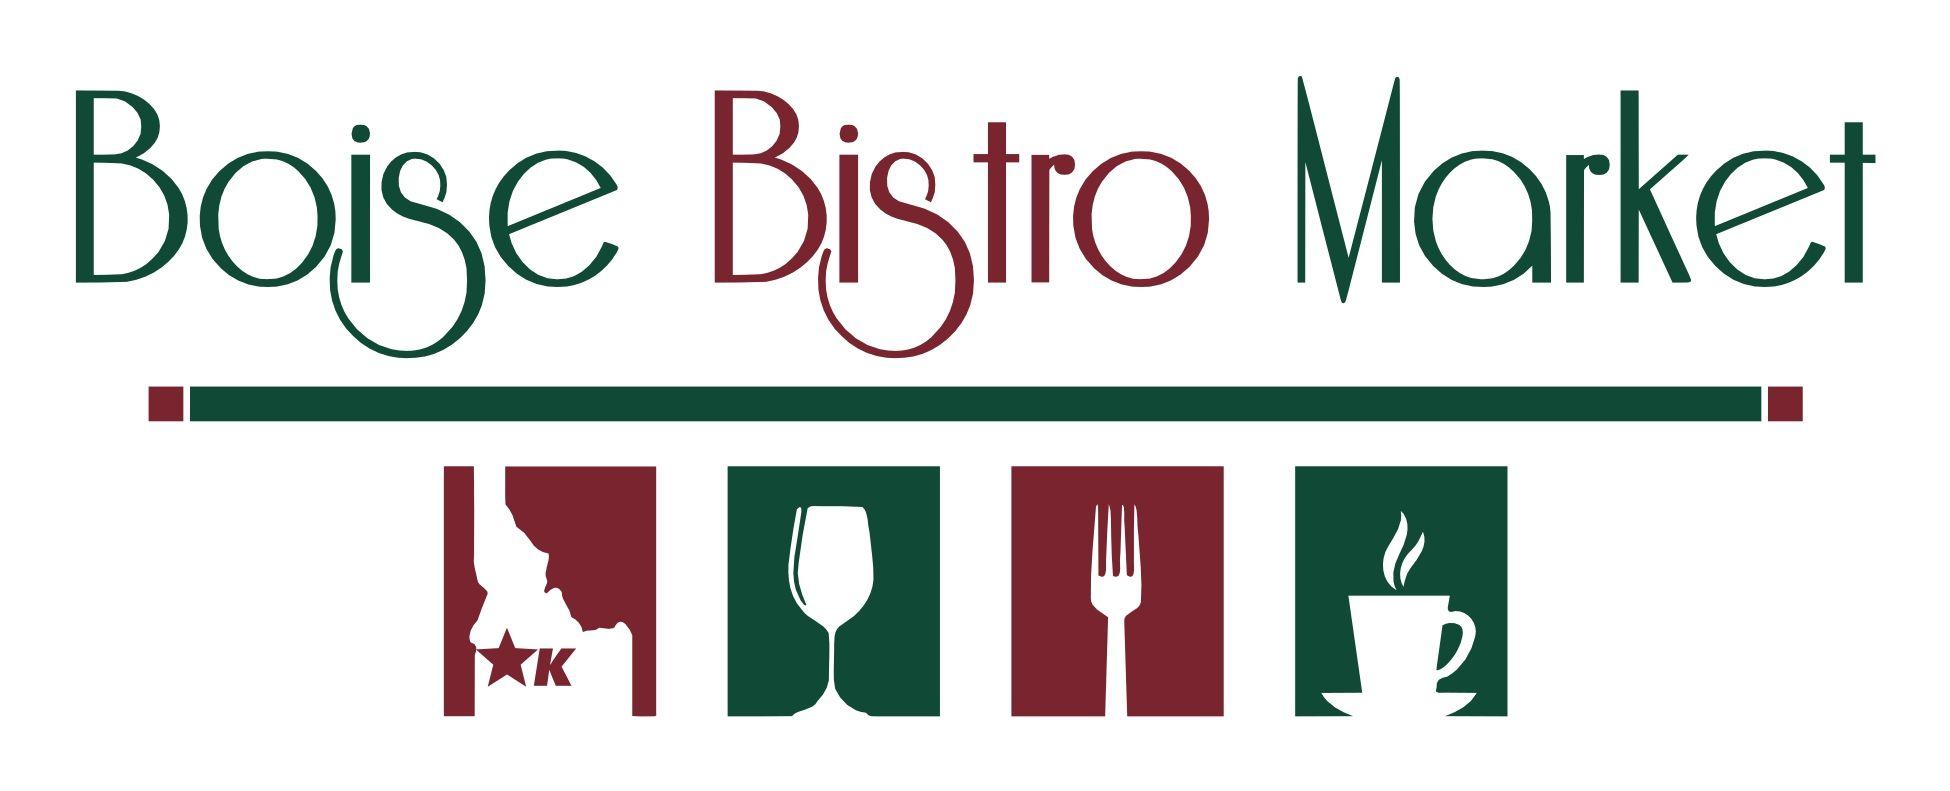 Boise Bistro Market